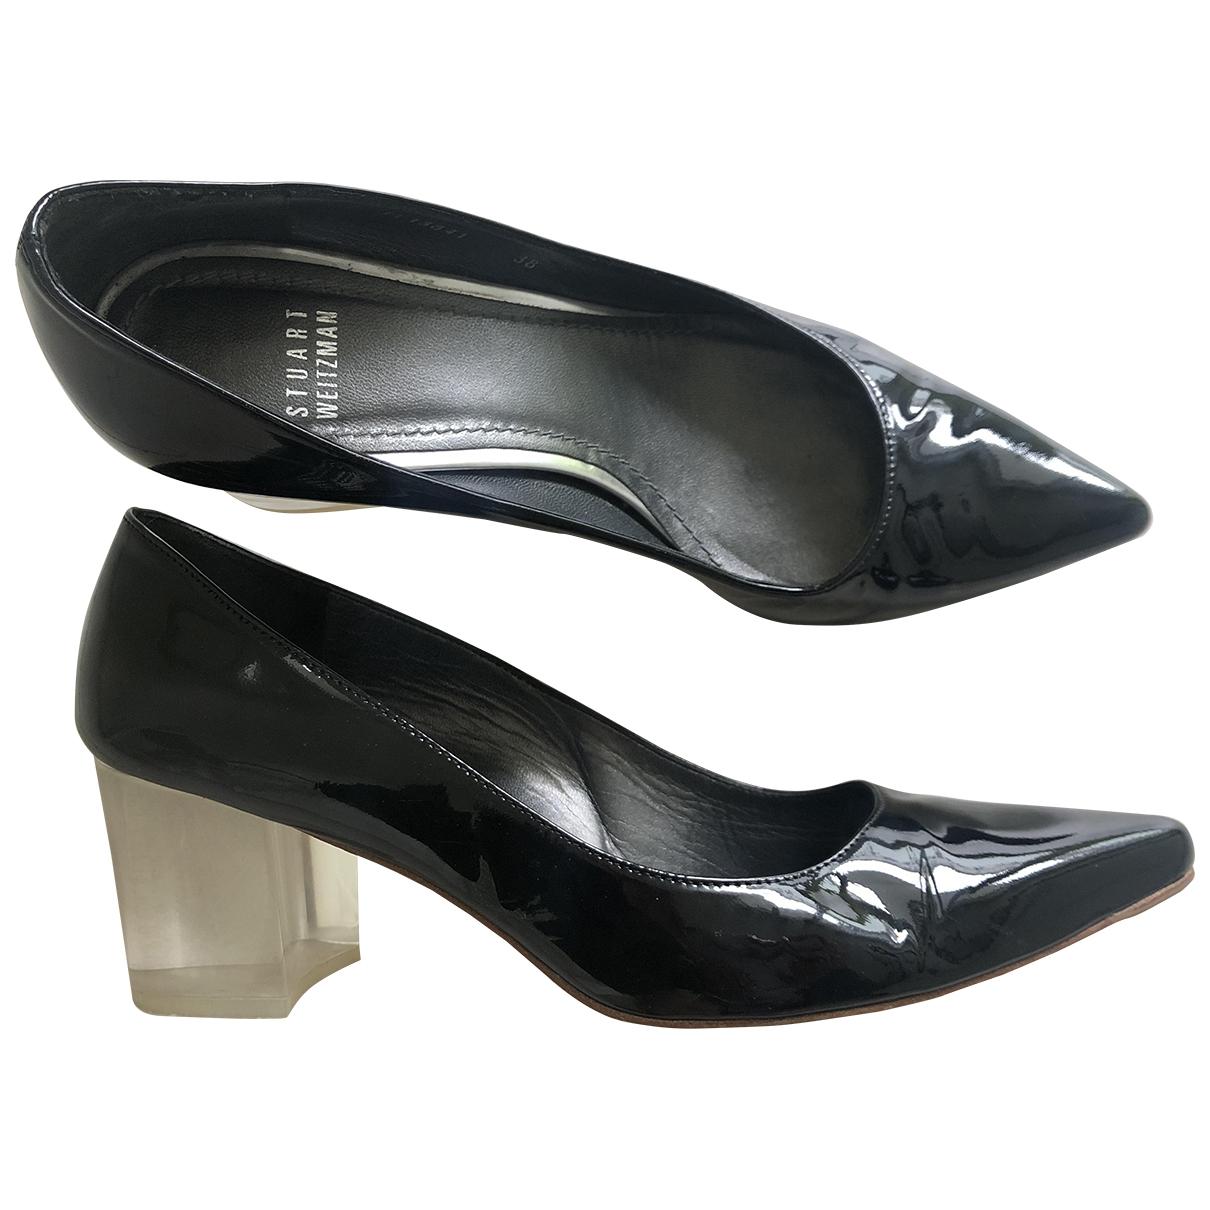 Stuart Weitzman \N Black Patent leather Heels for Women 38 EU